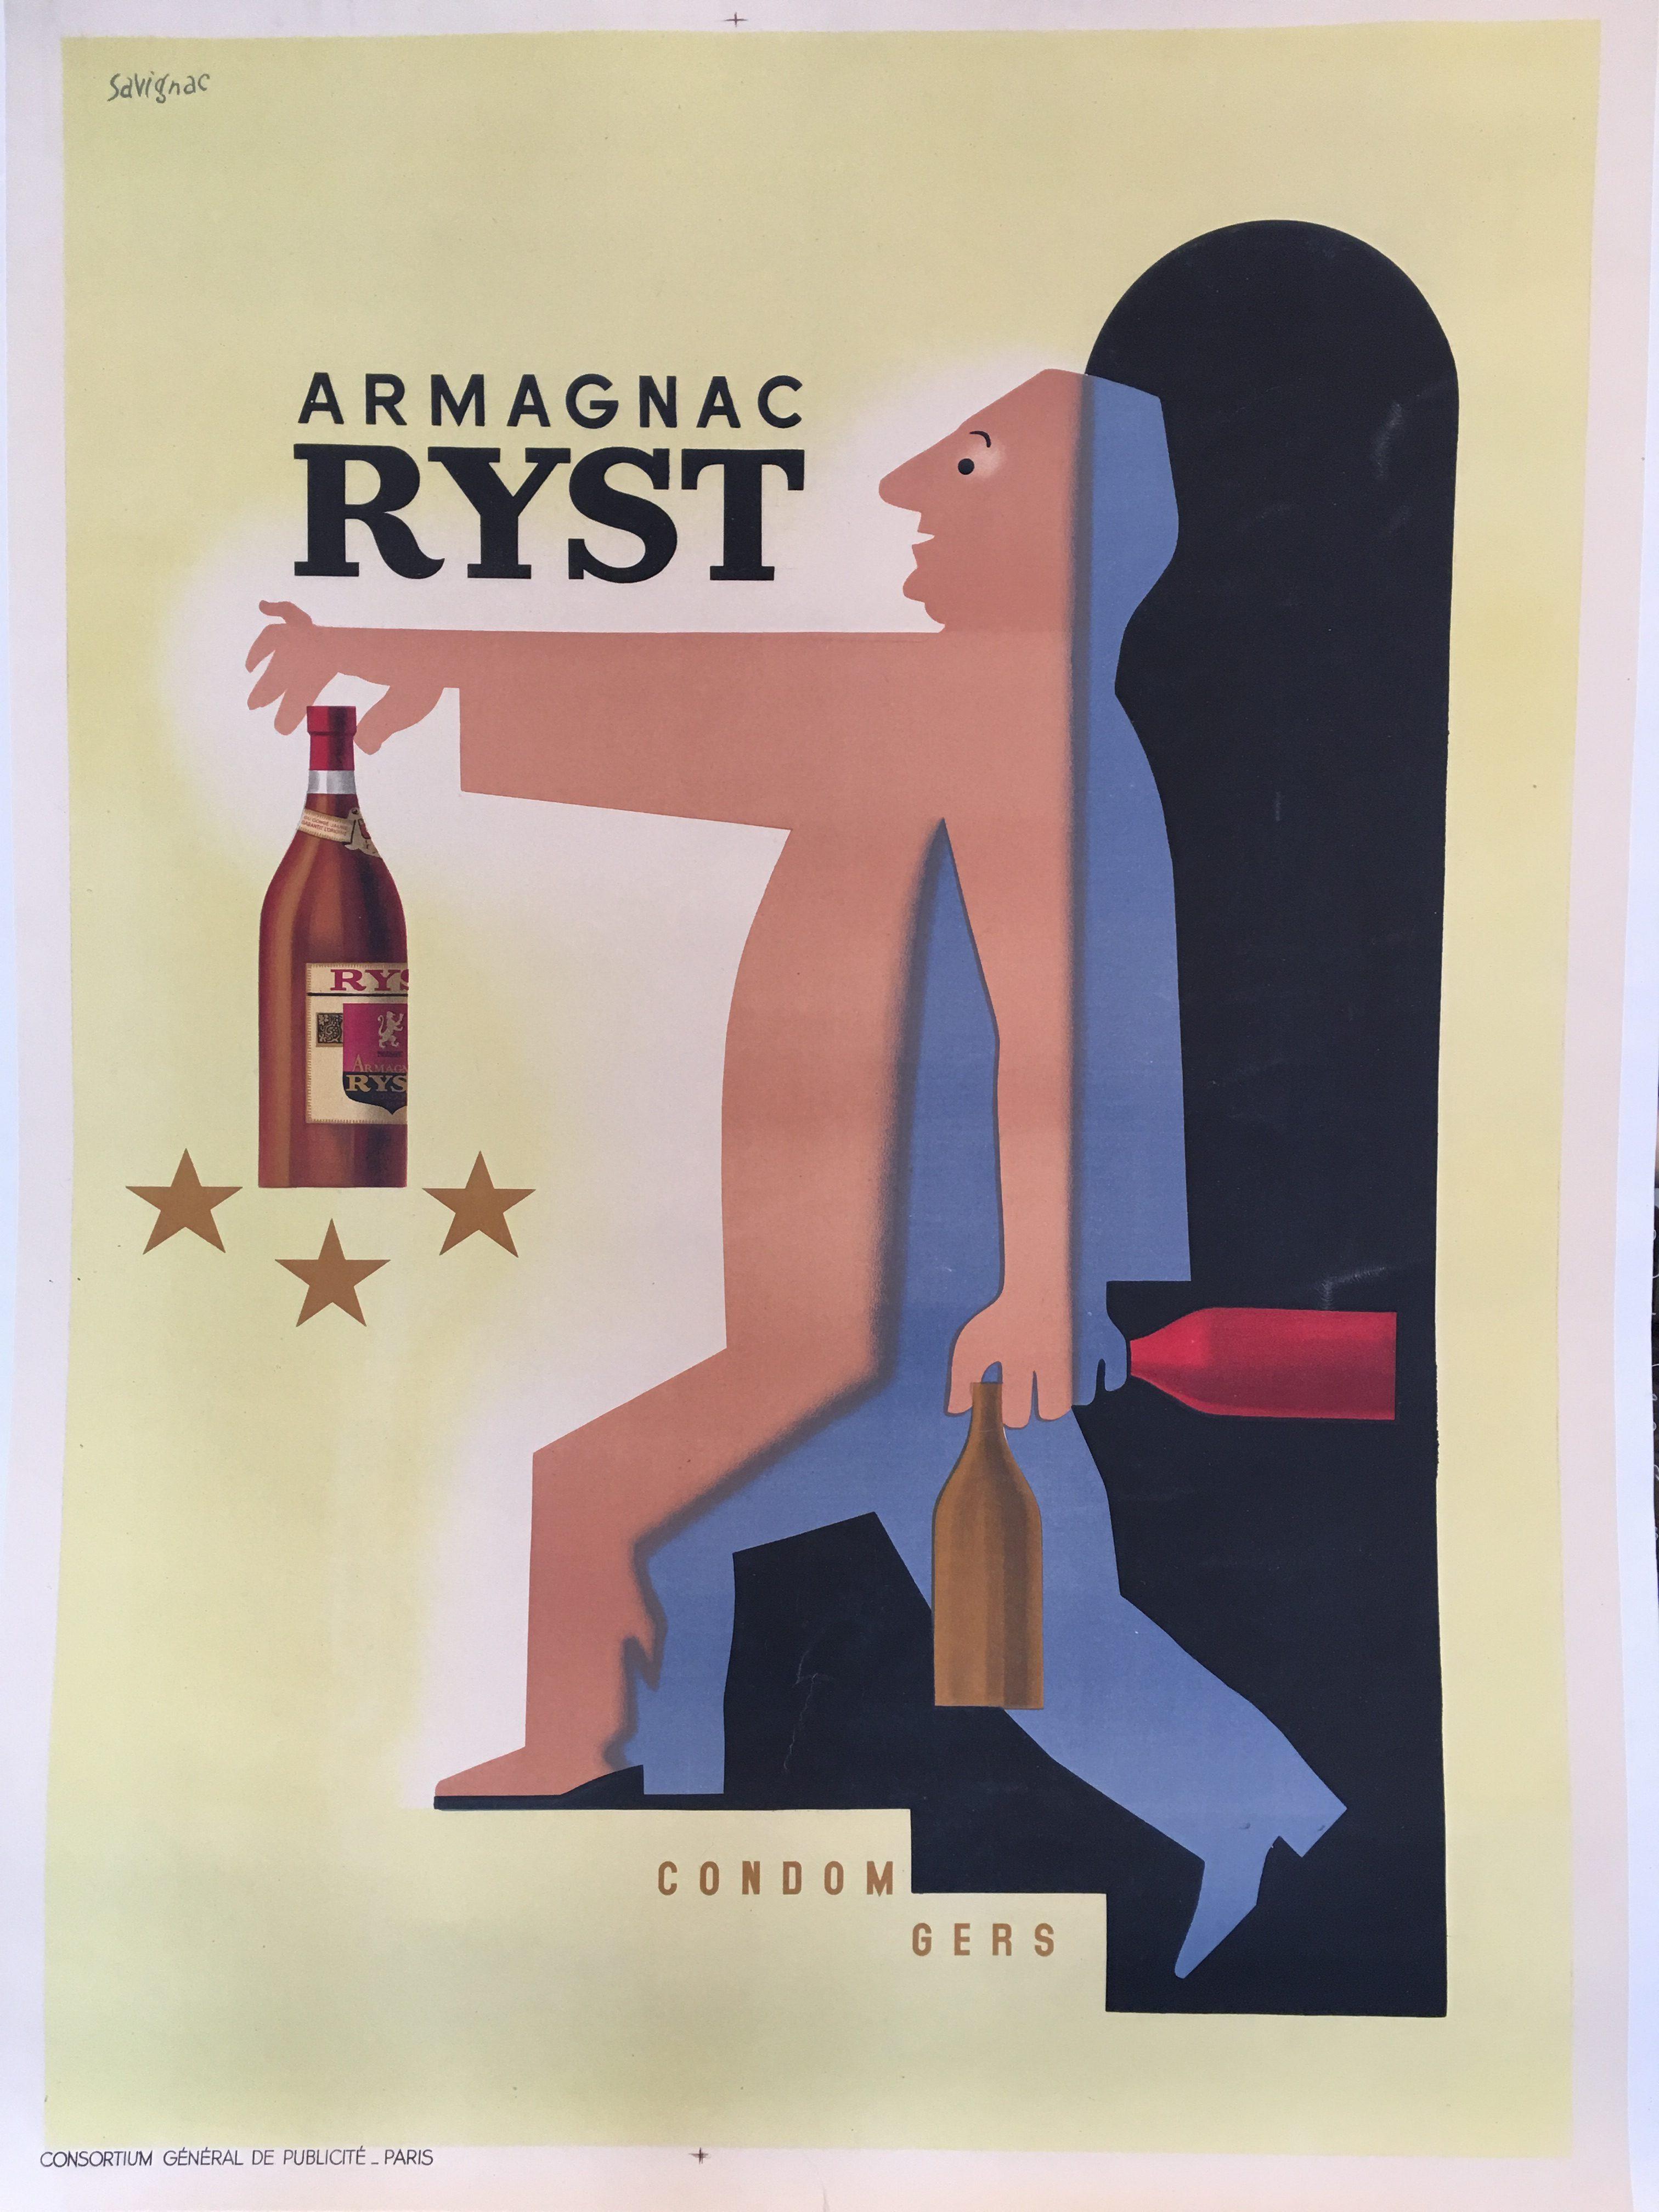 Armagnac Ryst by Savignac Original Vintage Poster